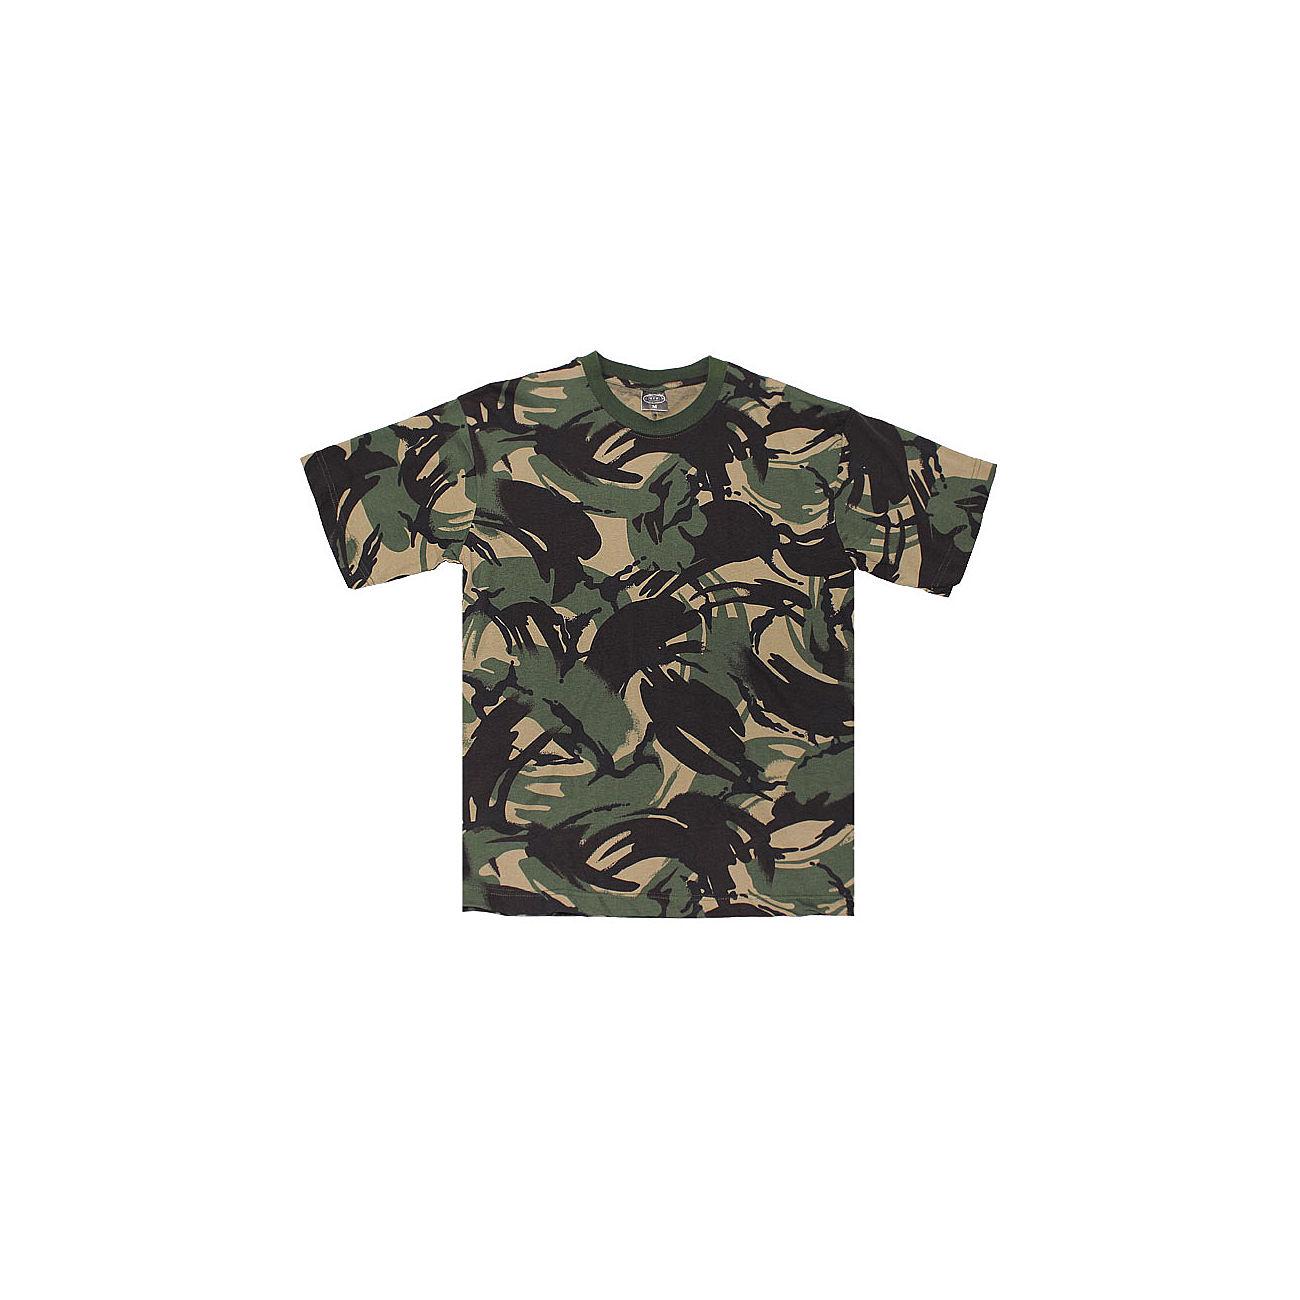 f474de715f2743 MFH T-Shirt dpm tarn günstig kaufen - Kotte & Zeller